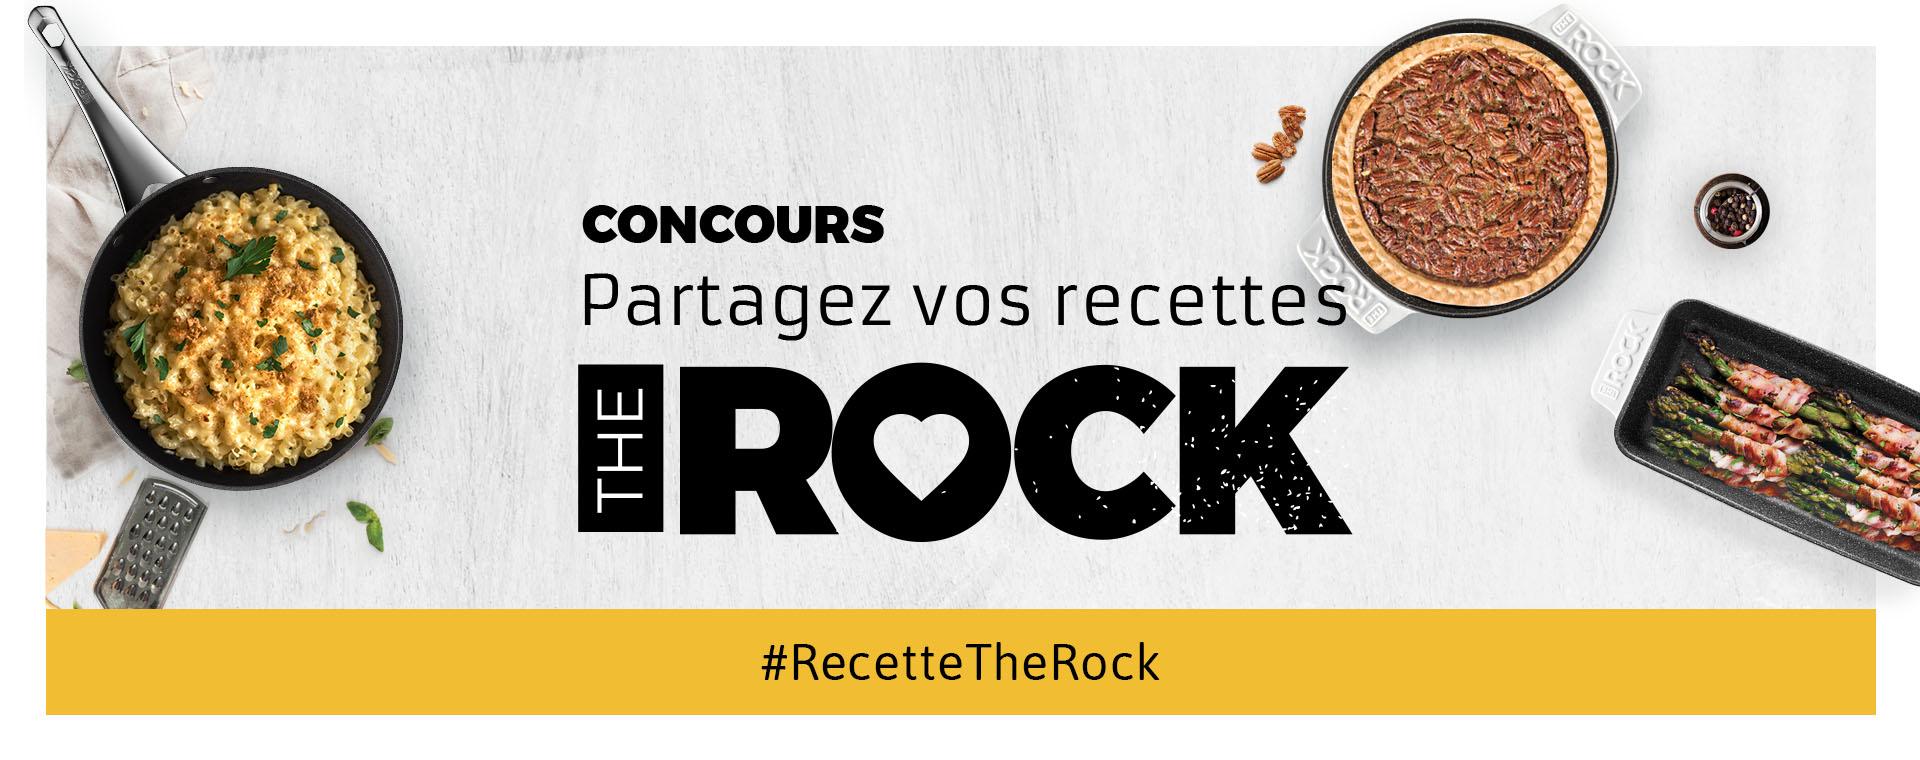 Concours Rocking Recipe FR